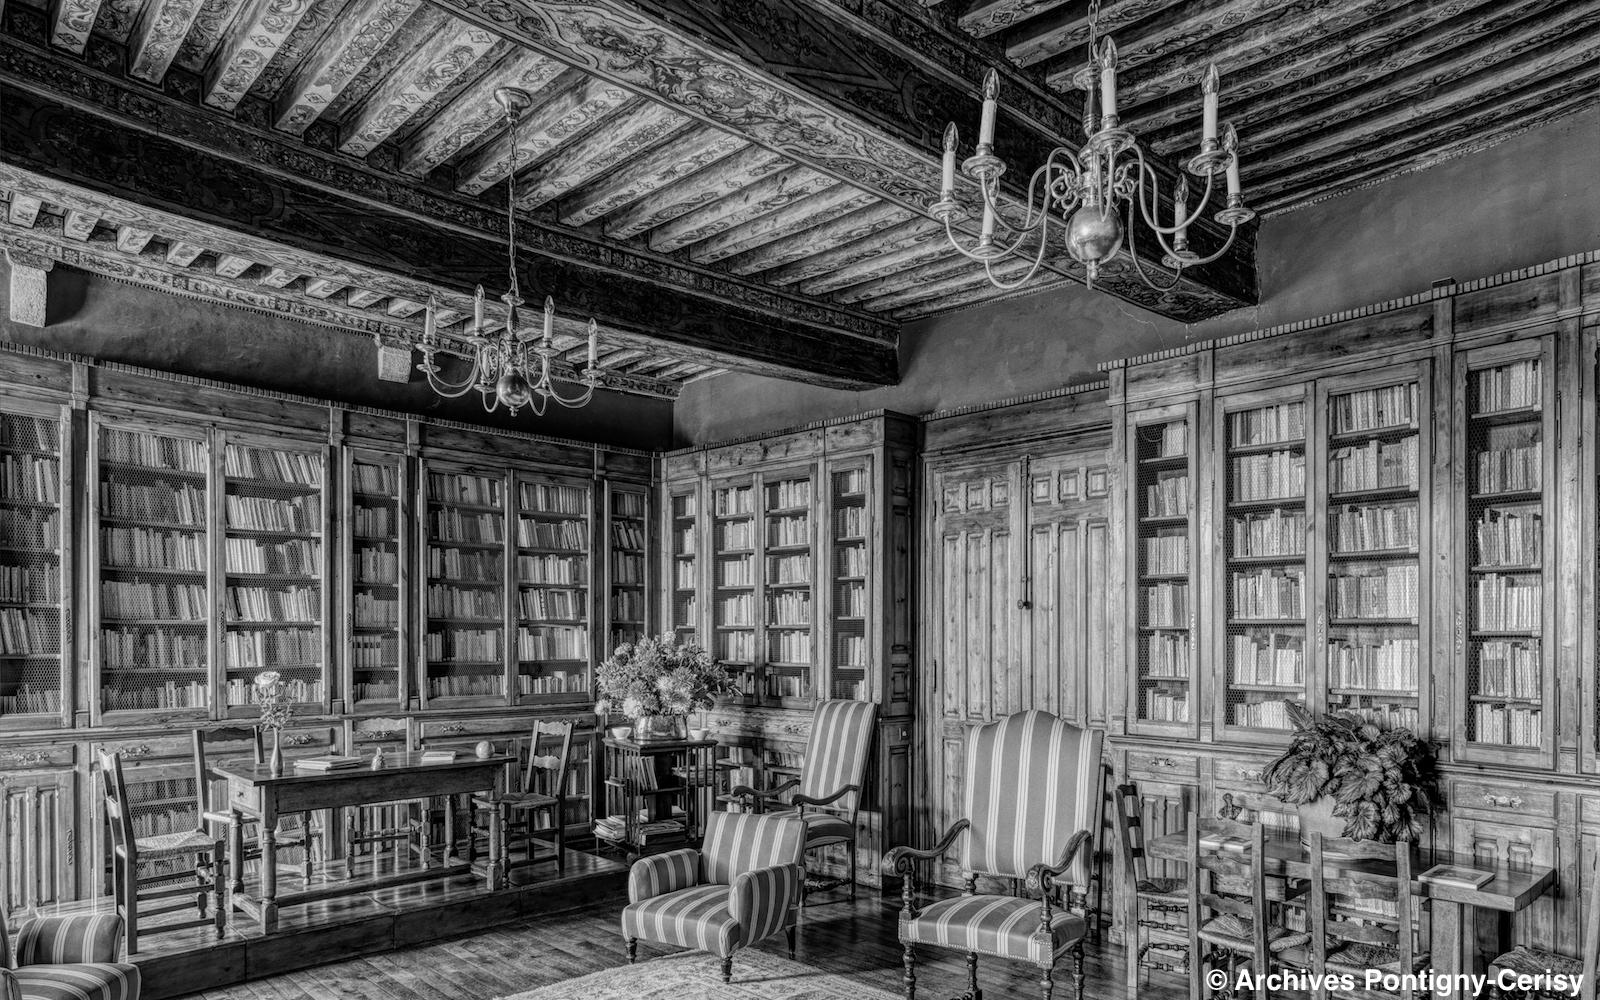 La bibliothèque de Cerisy